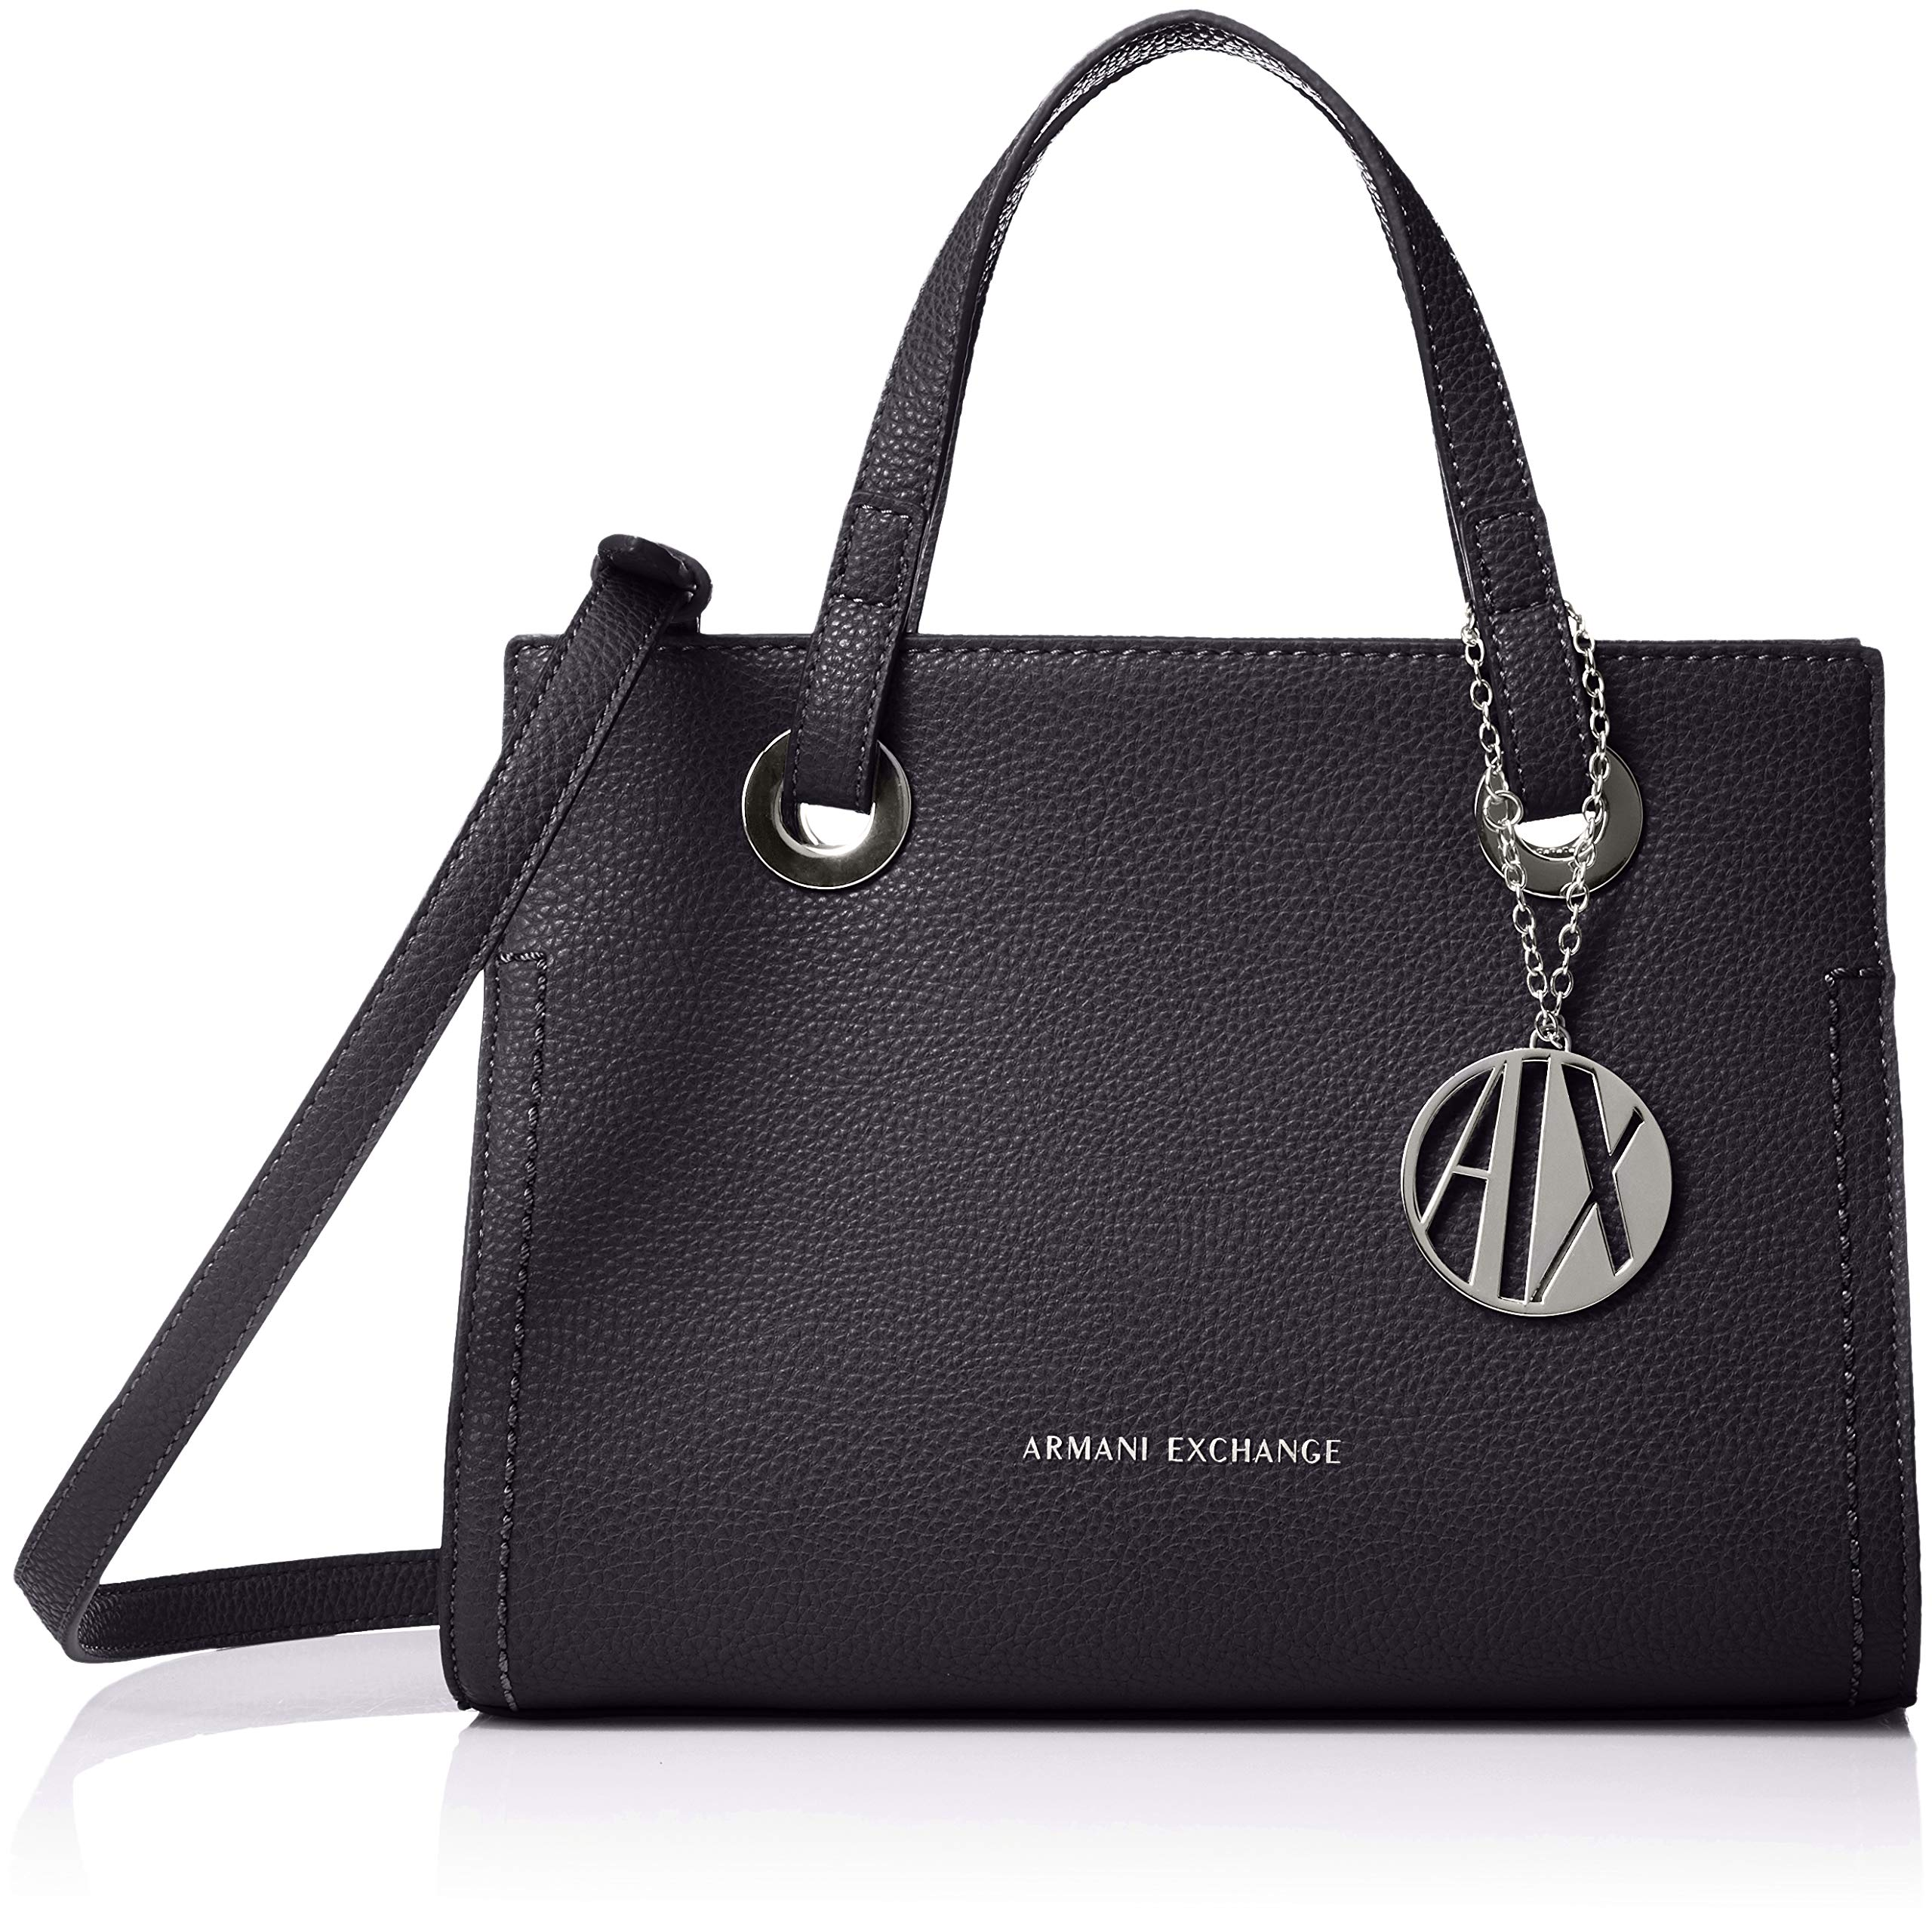 Exchange Small BagCabas Cmb FemmeBleunavy20x13x26 H Armani Shopping T X m8wynP0OvN